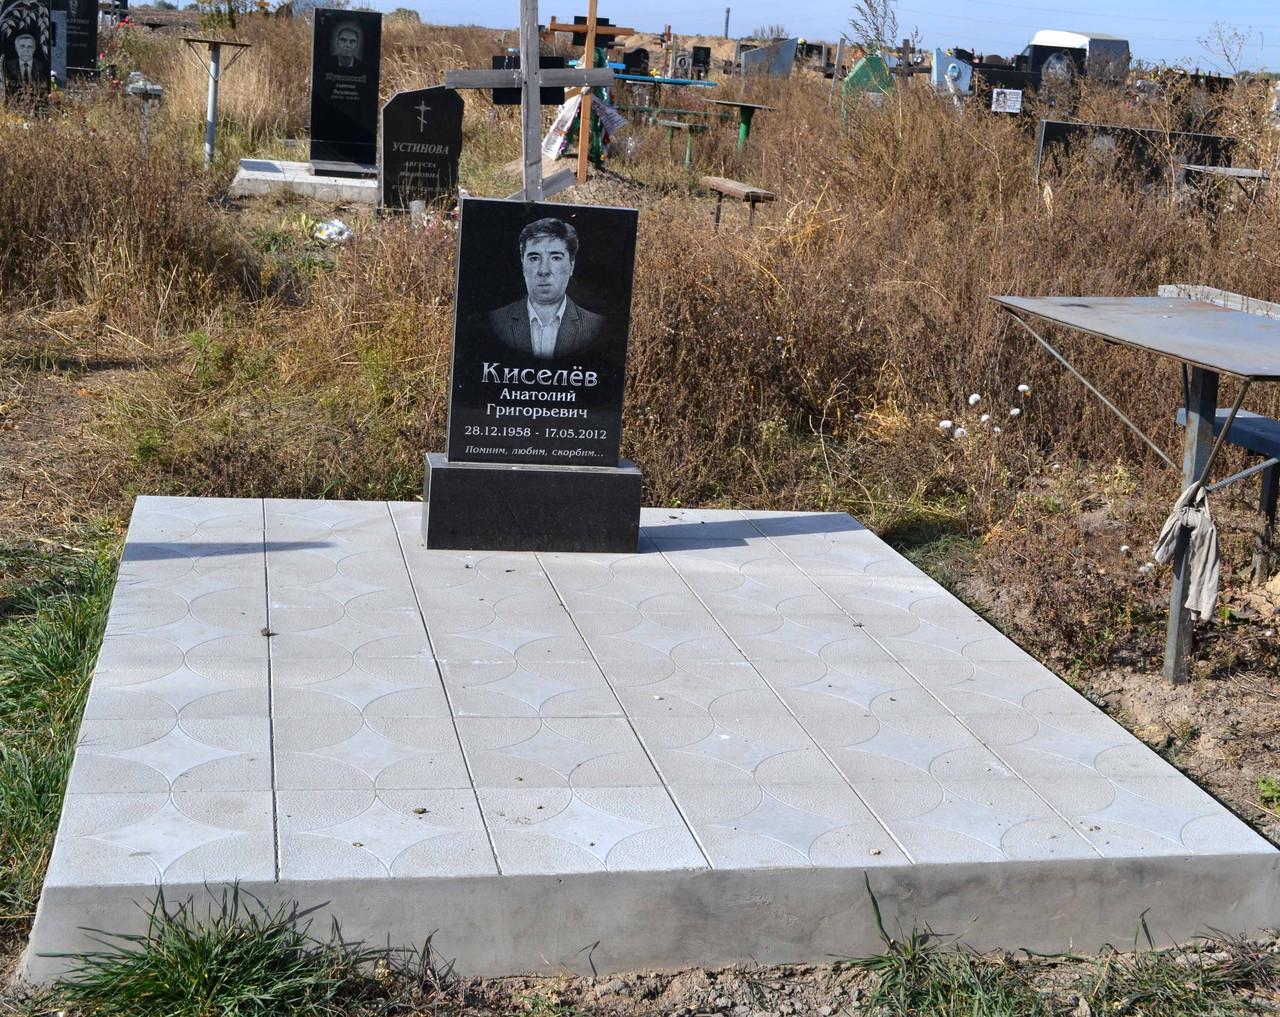 Памятник из гранита фото цена 0 5 памятник на могилу цены средние